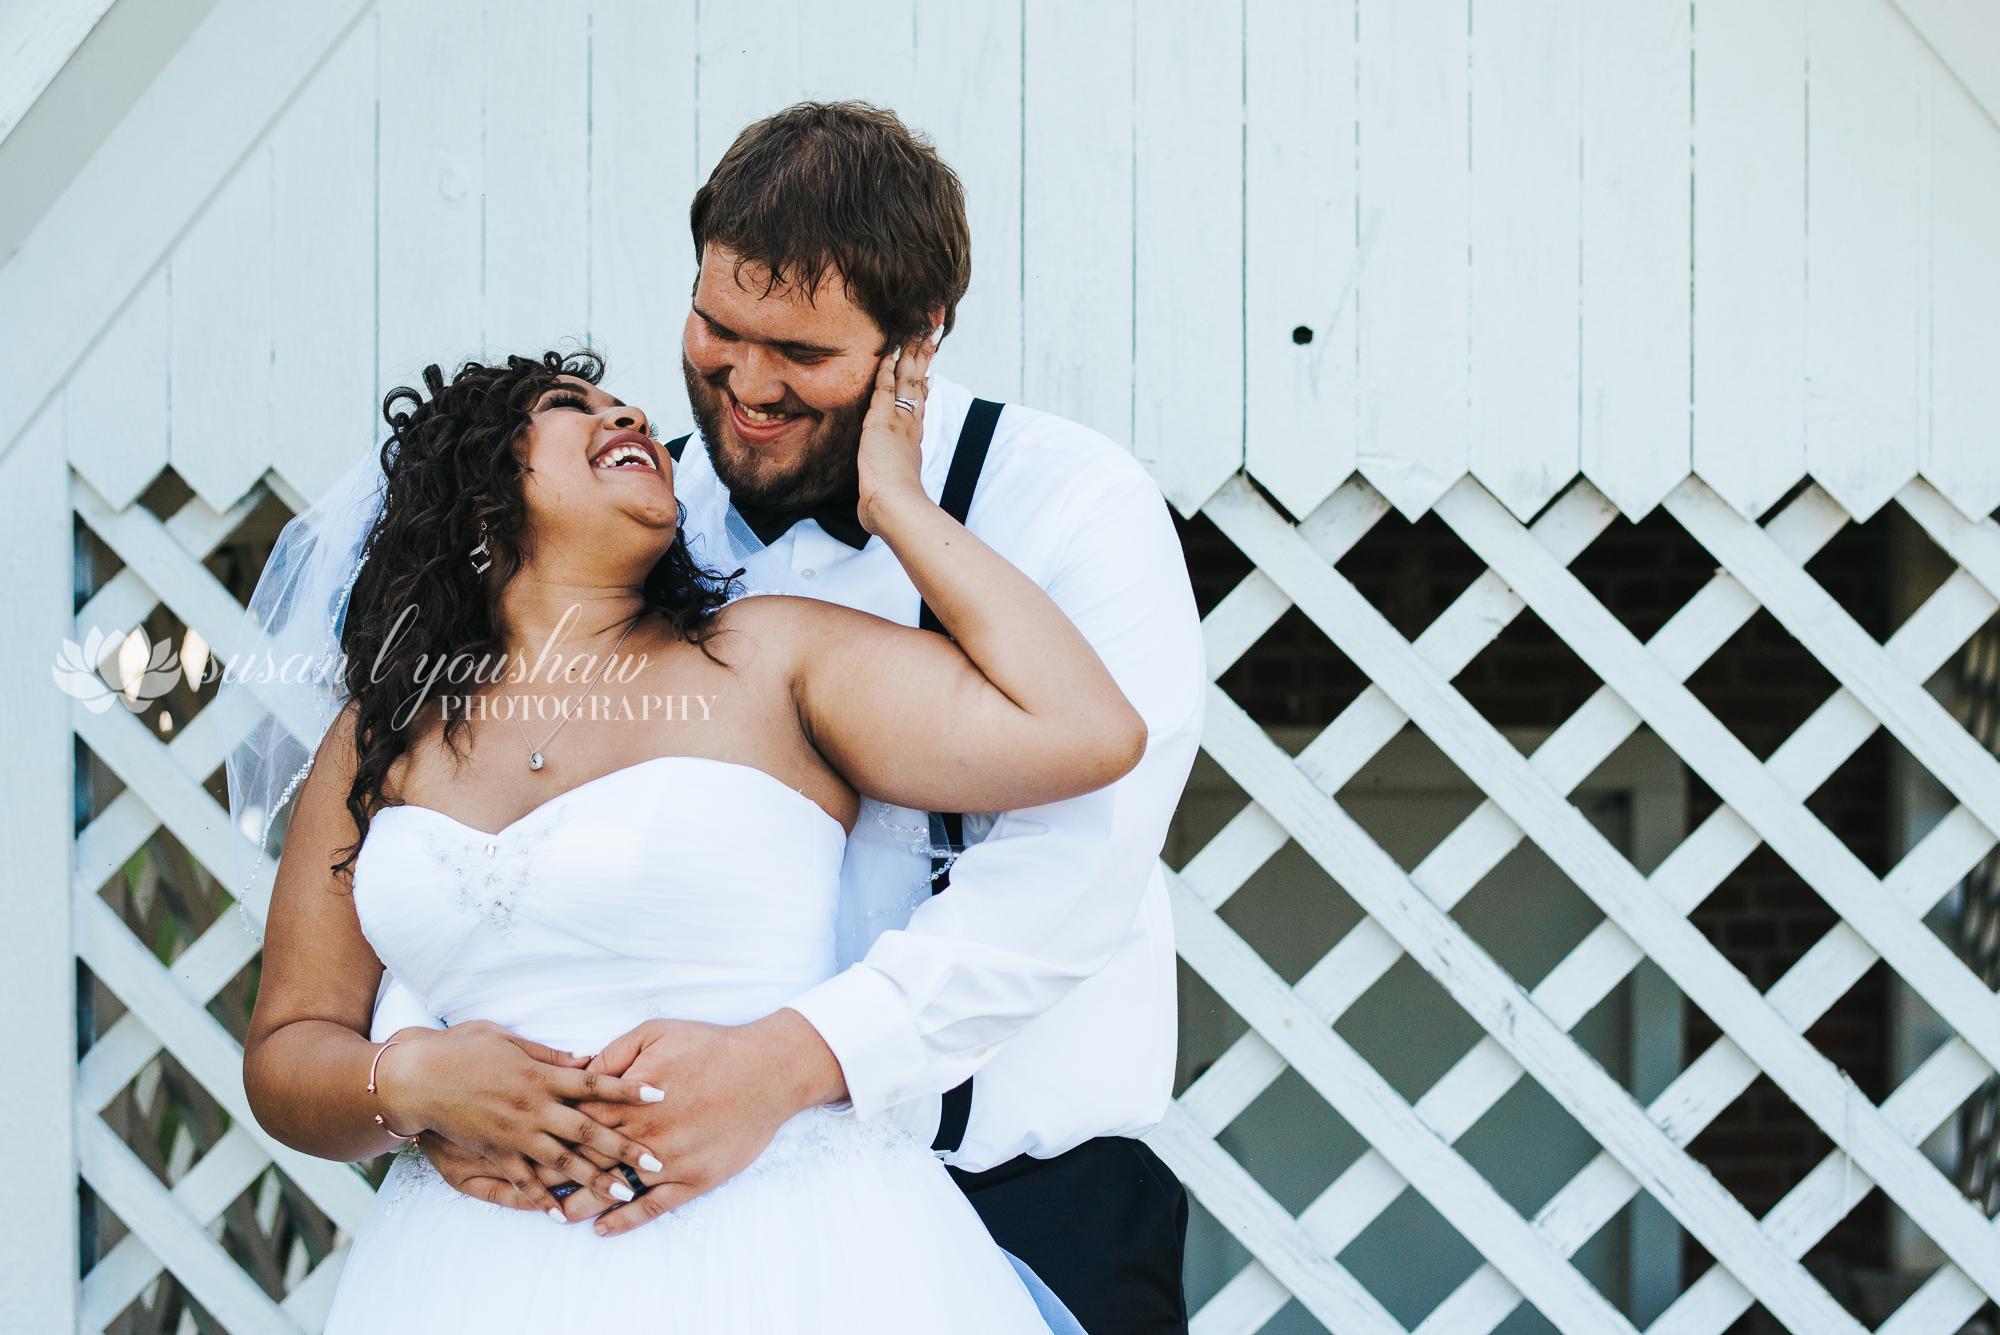 Katelyn and Wes Wedding Photos 07-13-2019 SLY Photography-100.jpg